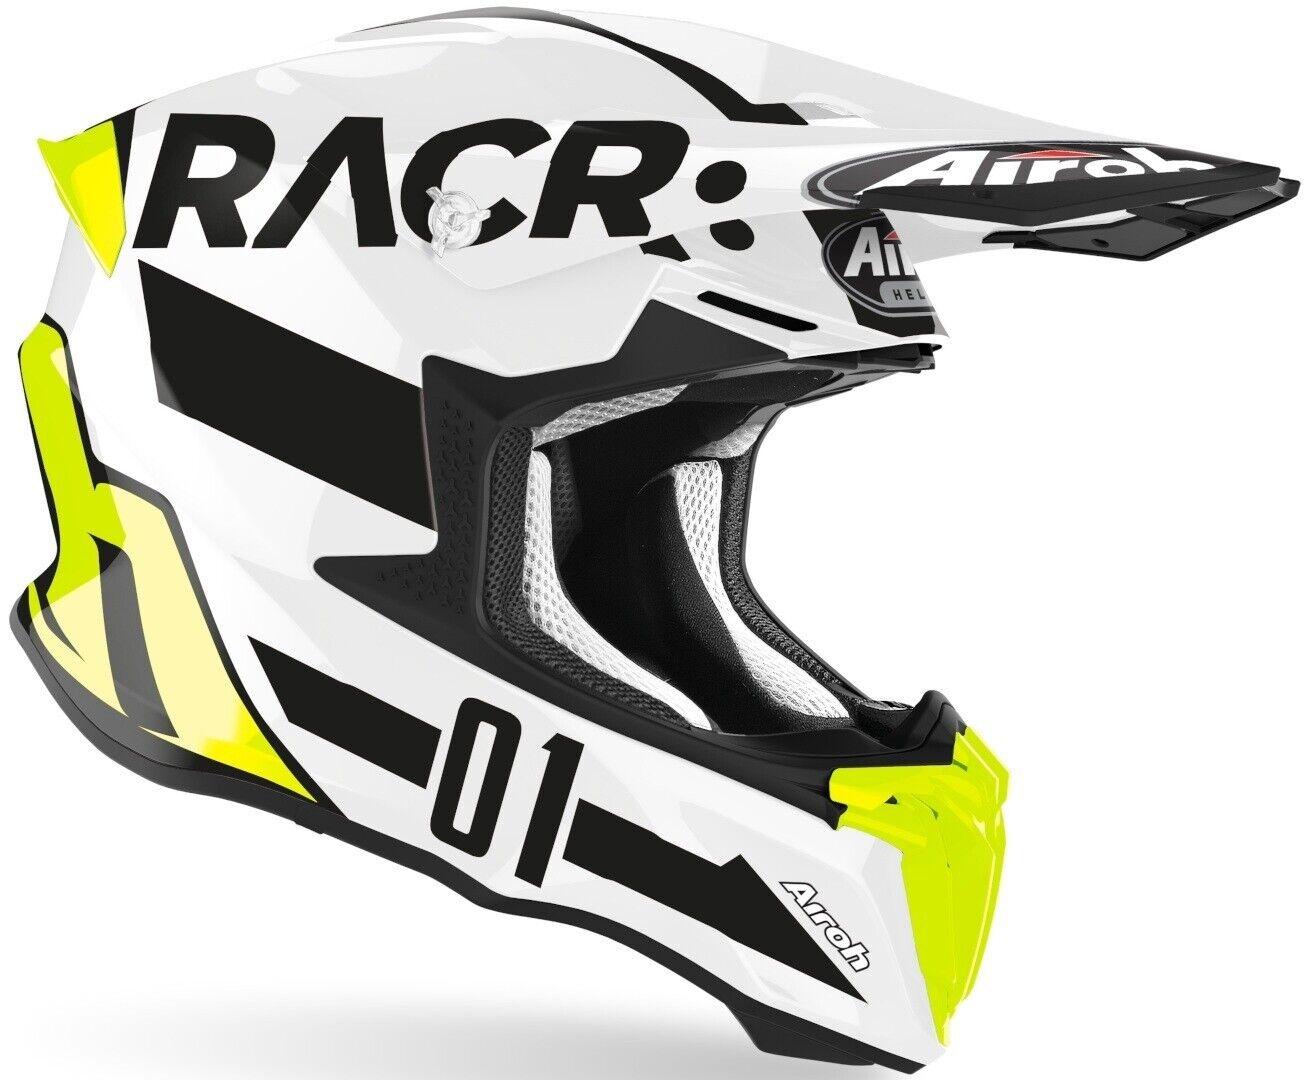 CASCO MOTO CROSS ENDURO QUAD AIROH TWIST RACR CAIROLI 2020 GIALLO FLUO TW2RA17